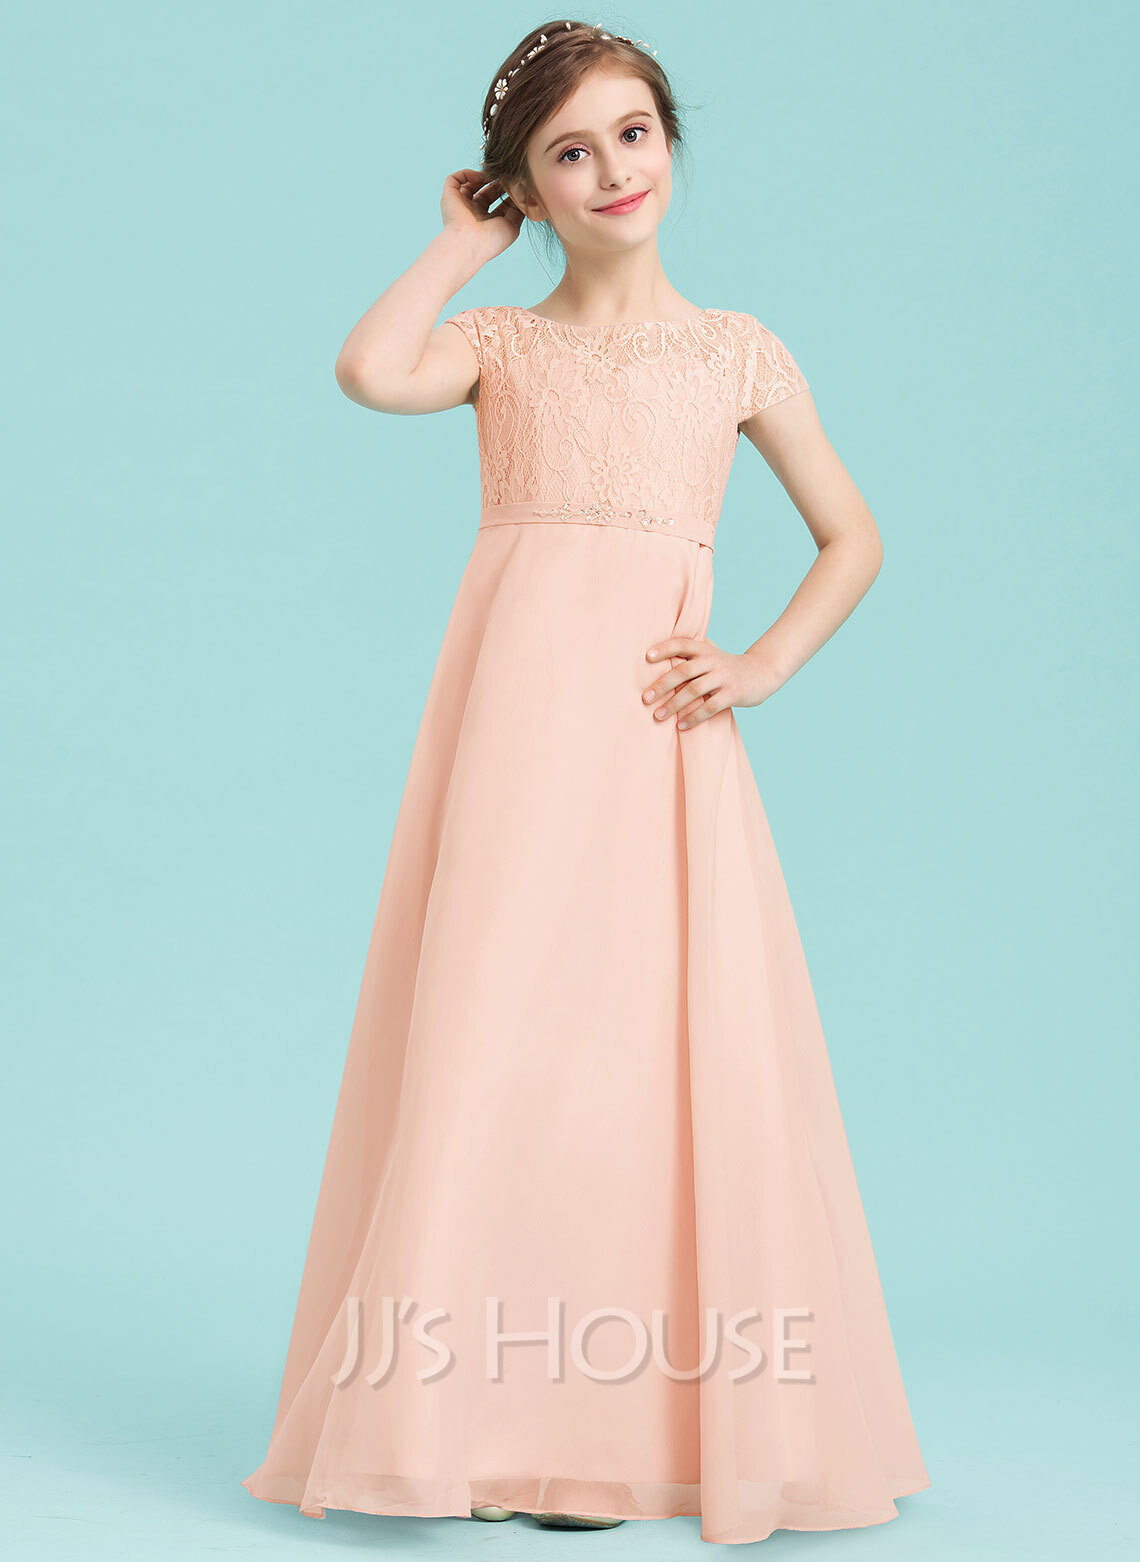 A-Line Scoop Neck Floor-Length Chiffon Junior Bridesmaid Dress With Beading